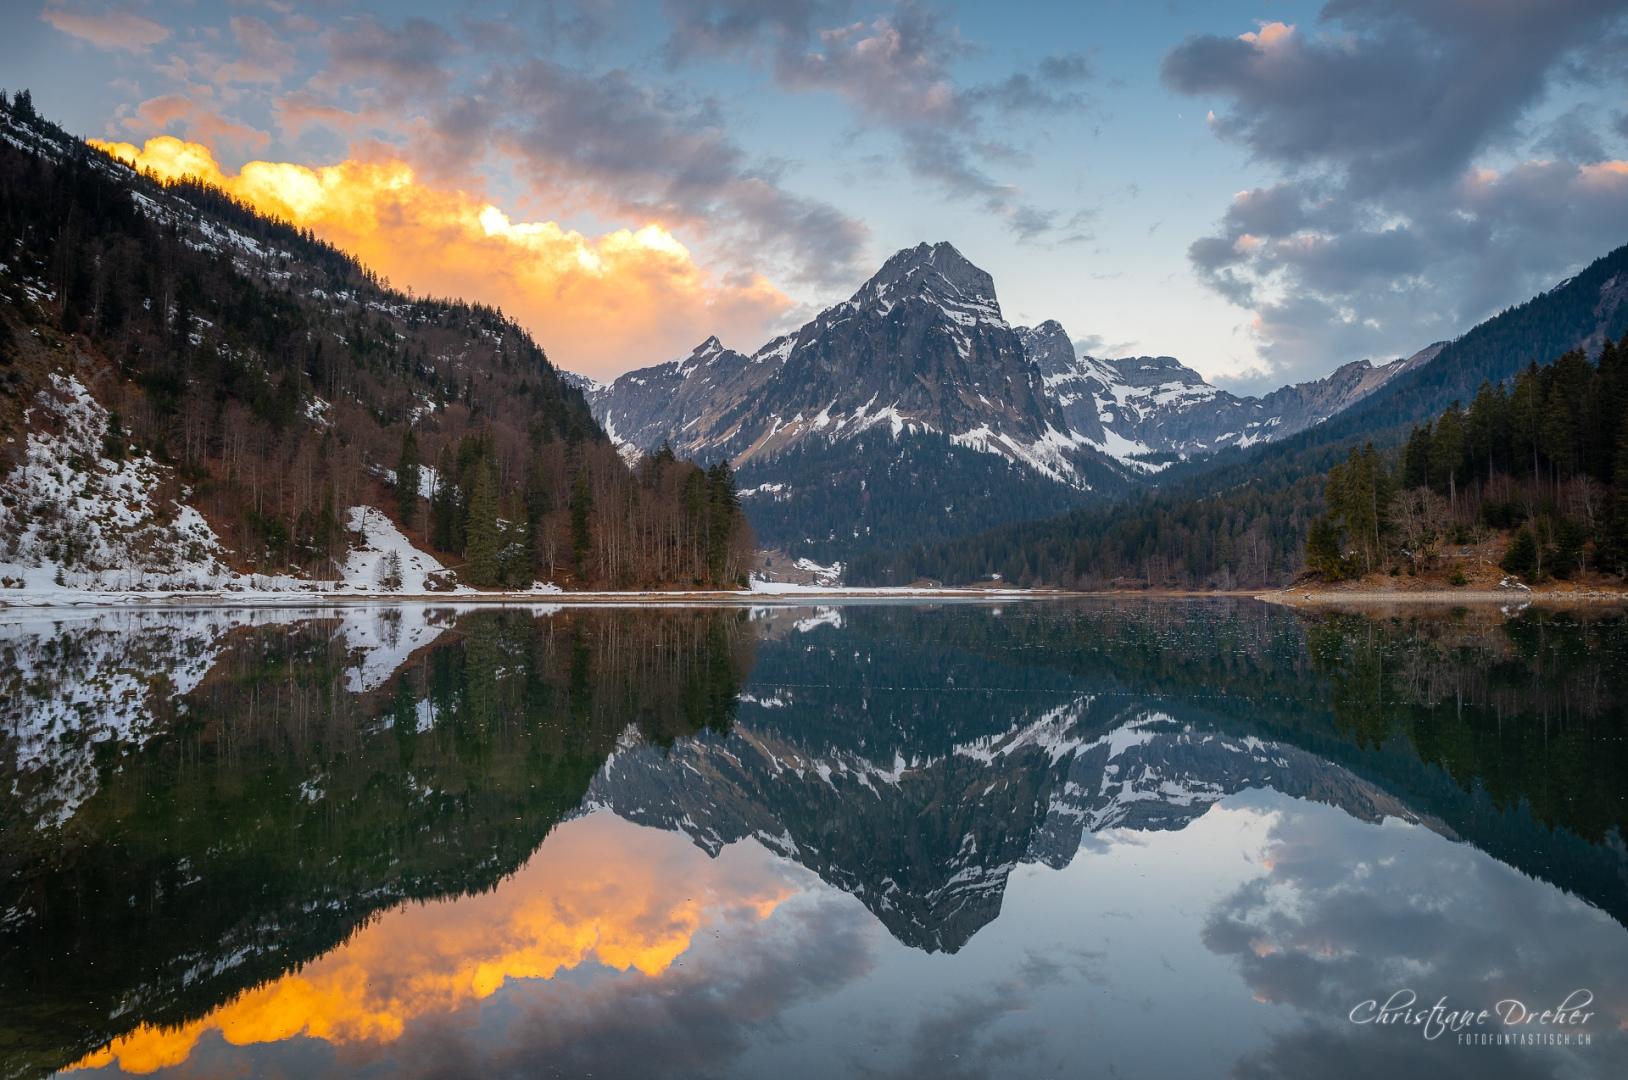 Sonnenaufgang Obersee - ©Christiane Dreher